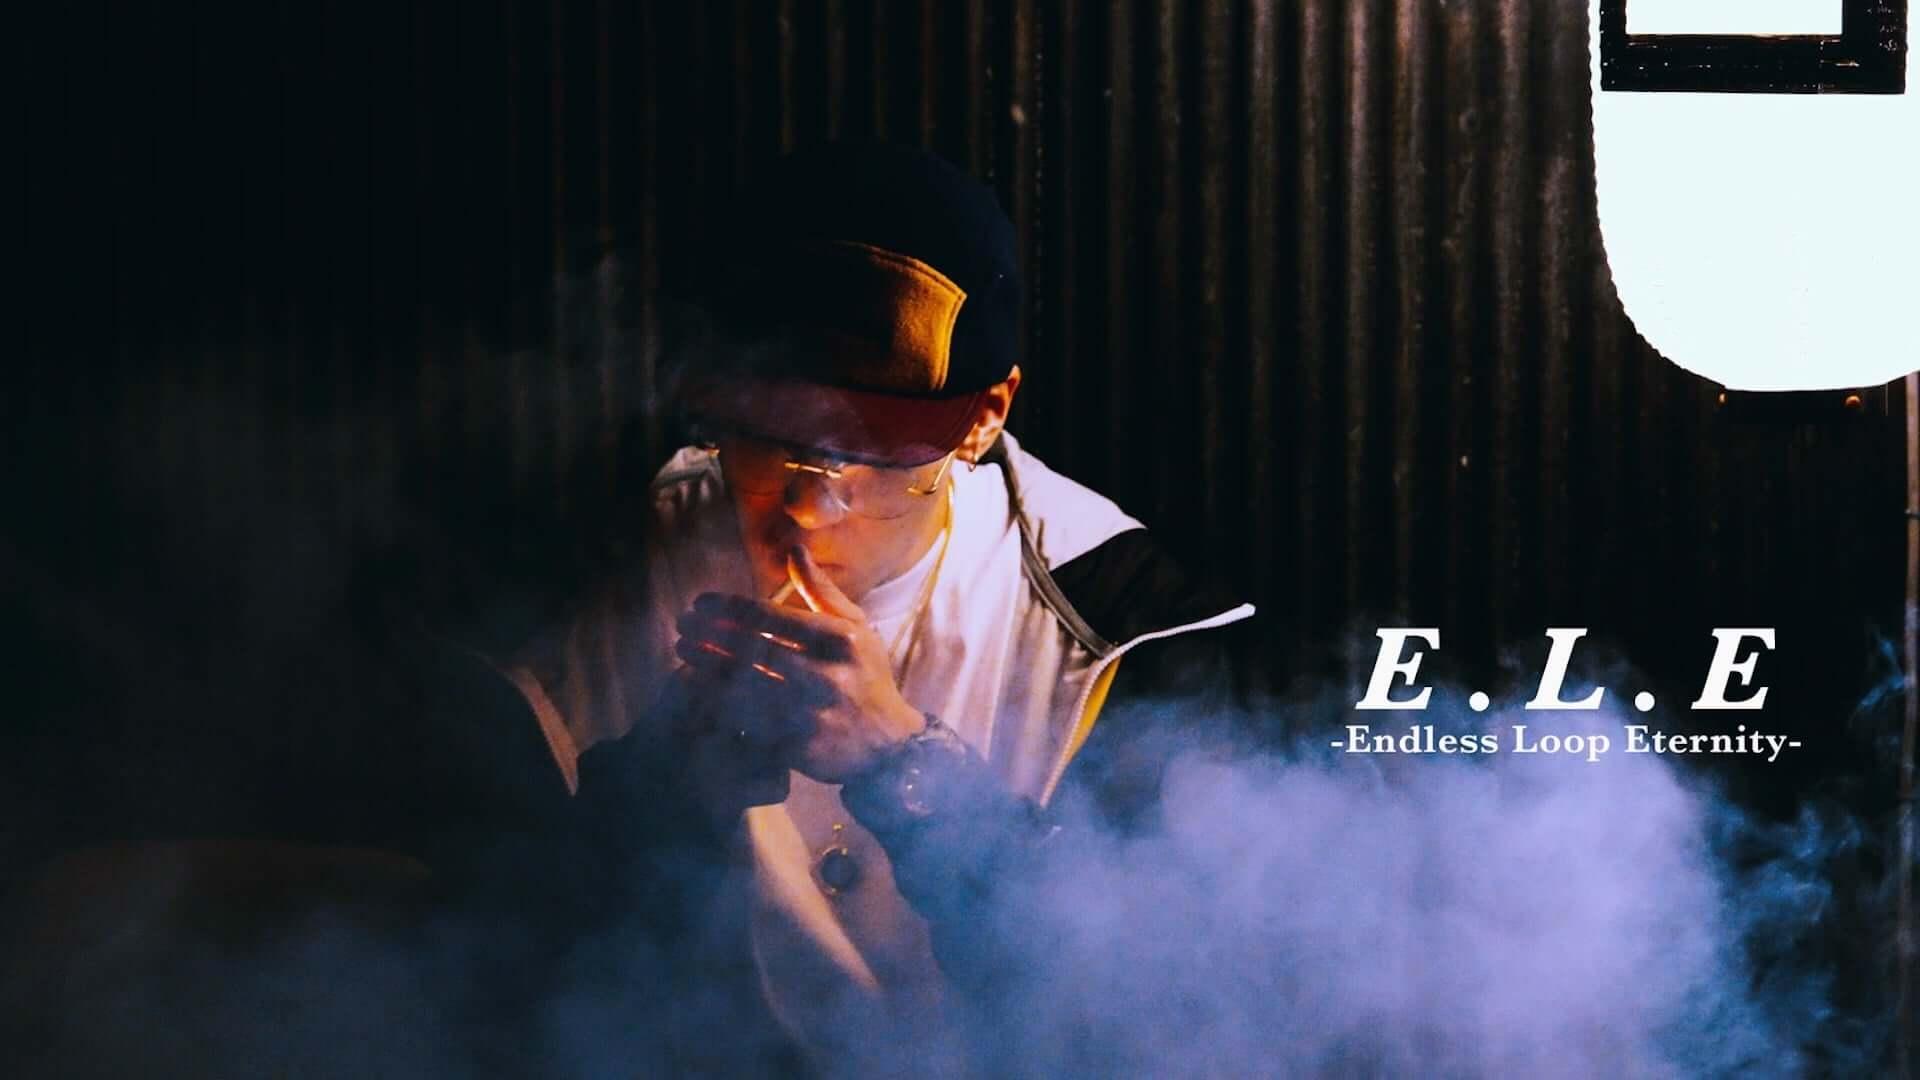 "SILENT KILLA JOINTとdhrmaのジョイントアルバム『DAWN』が本日リリース!収録曲""E.L.E""のMVも公開 music210310_silent-killa-joint_3-1920x1080"